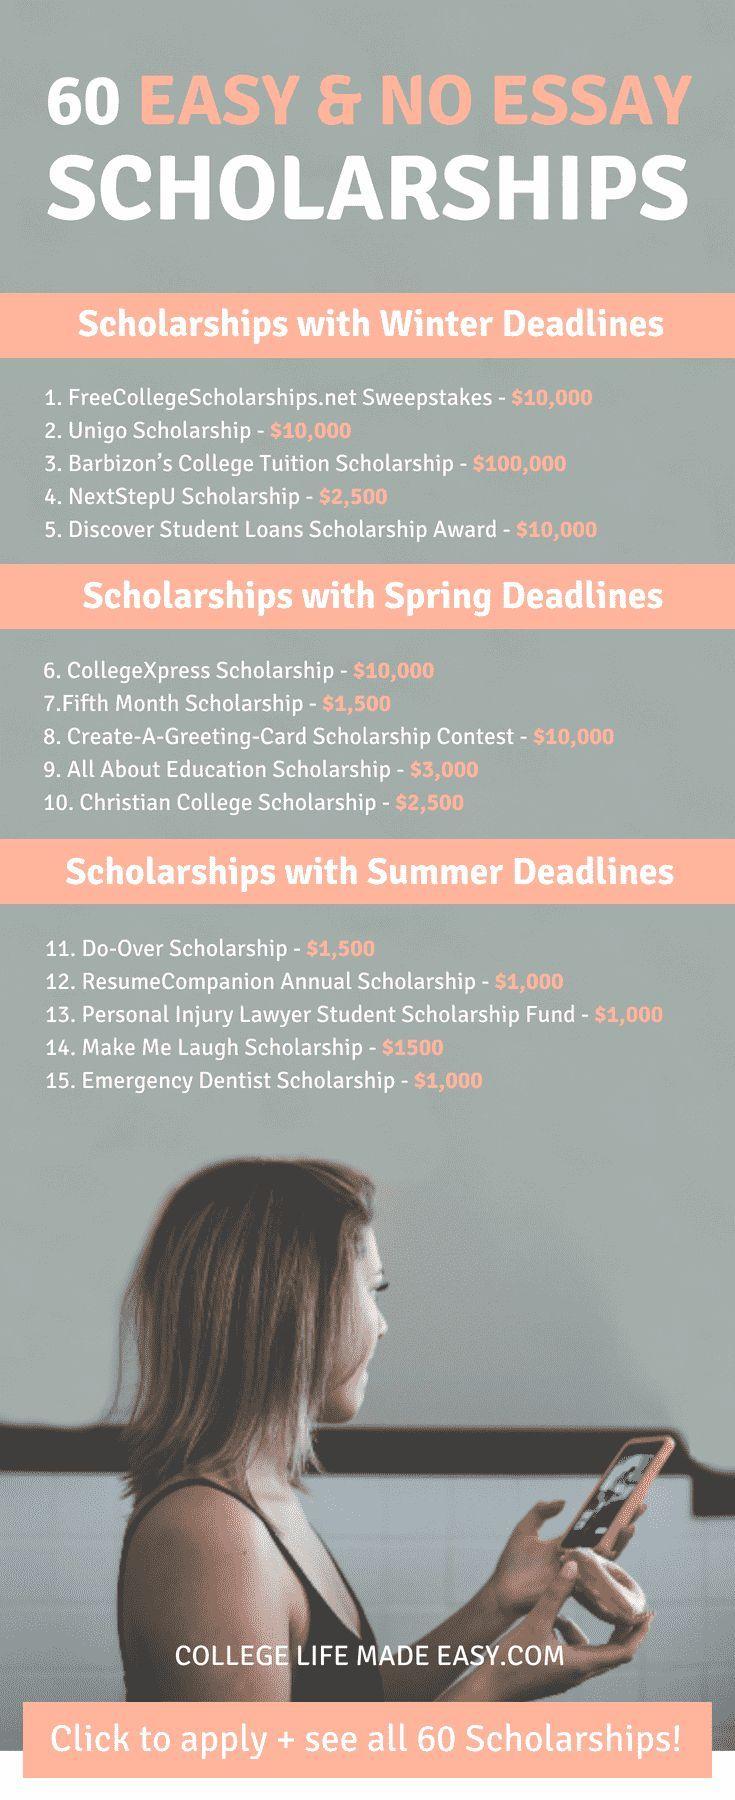 002 Essay Example Easy No Striking Scholarships 2015 2019 Full